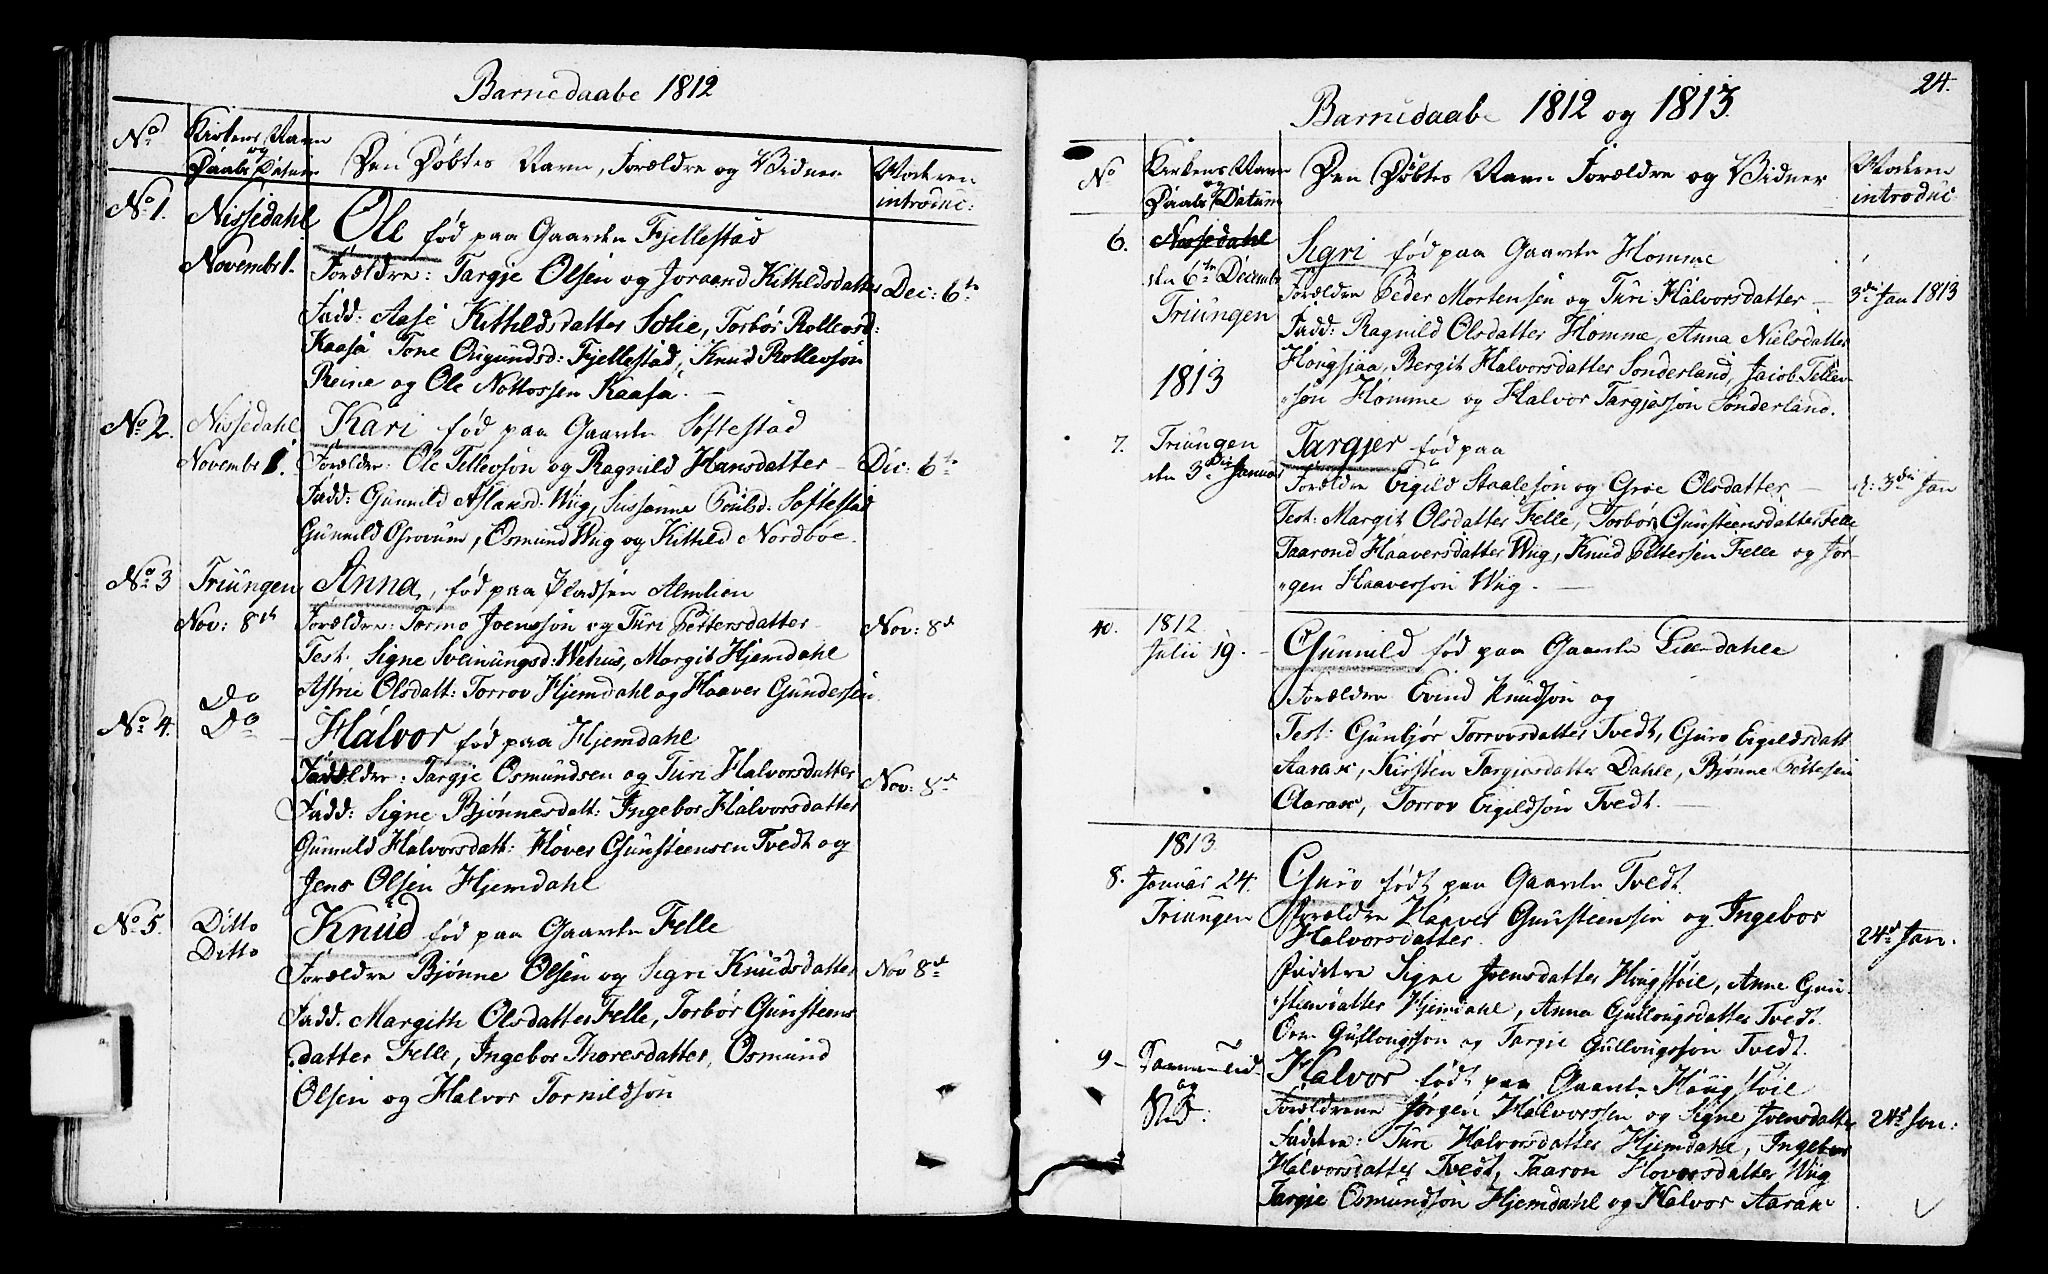 SAKO, Nissedal kirkebøker, F/Fa/L0001: Ministerialbok nr. I 1, 1811-1814, s. 24